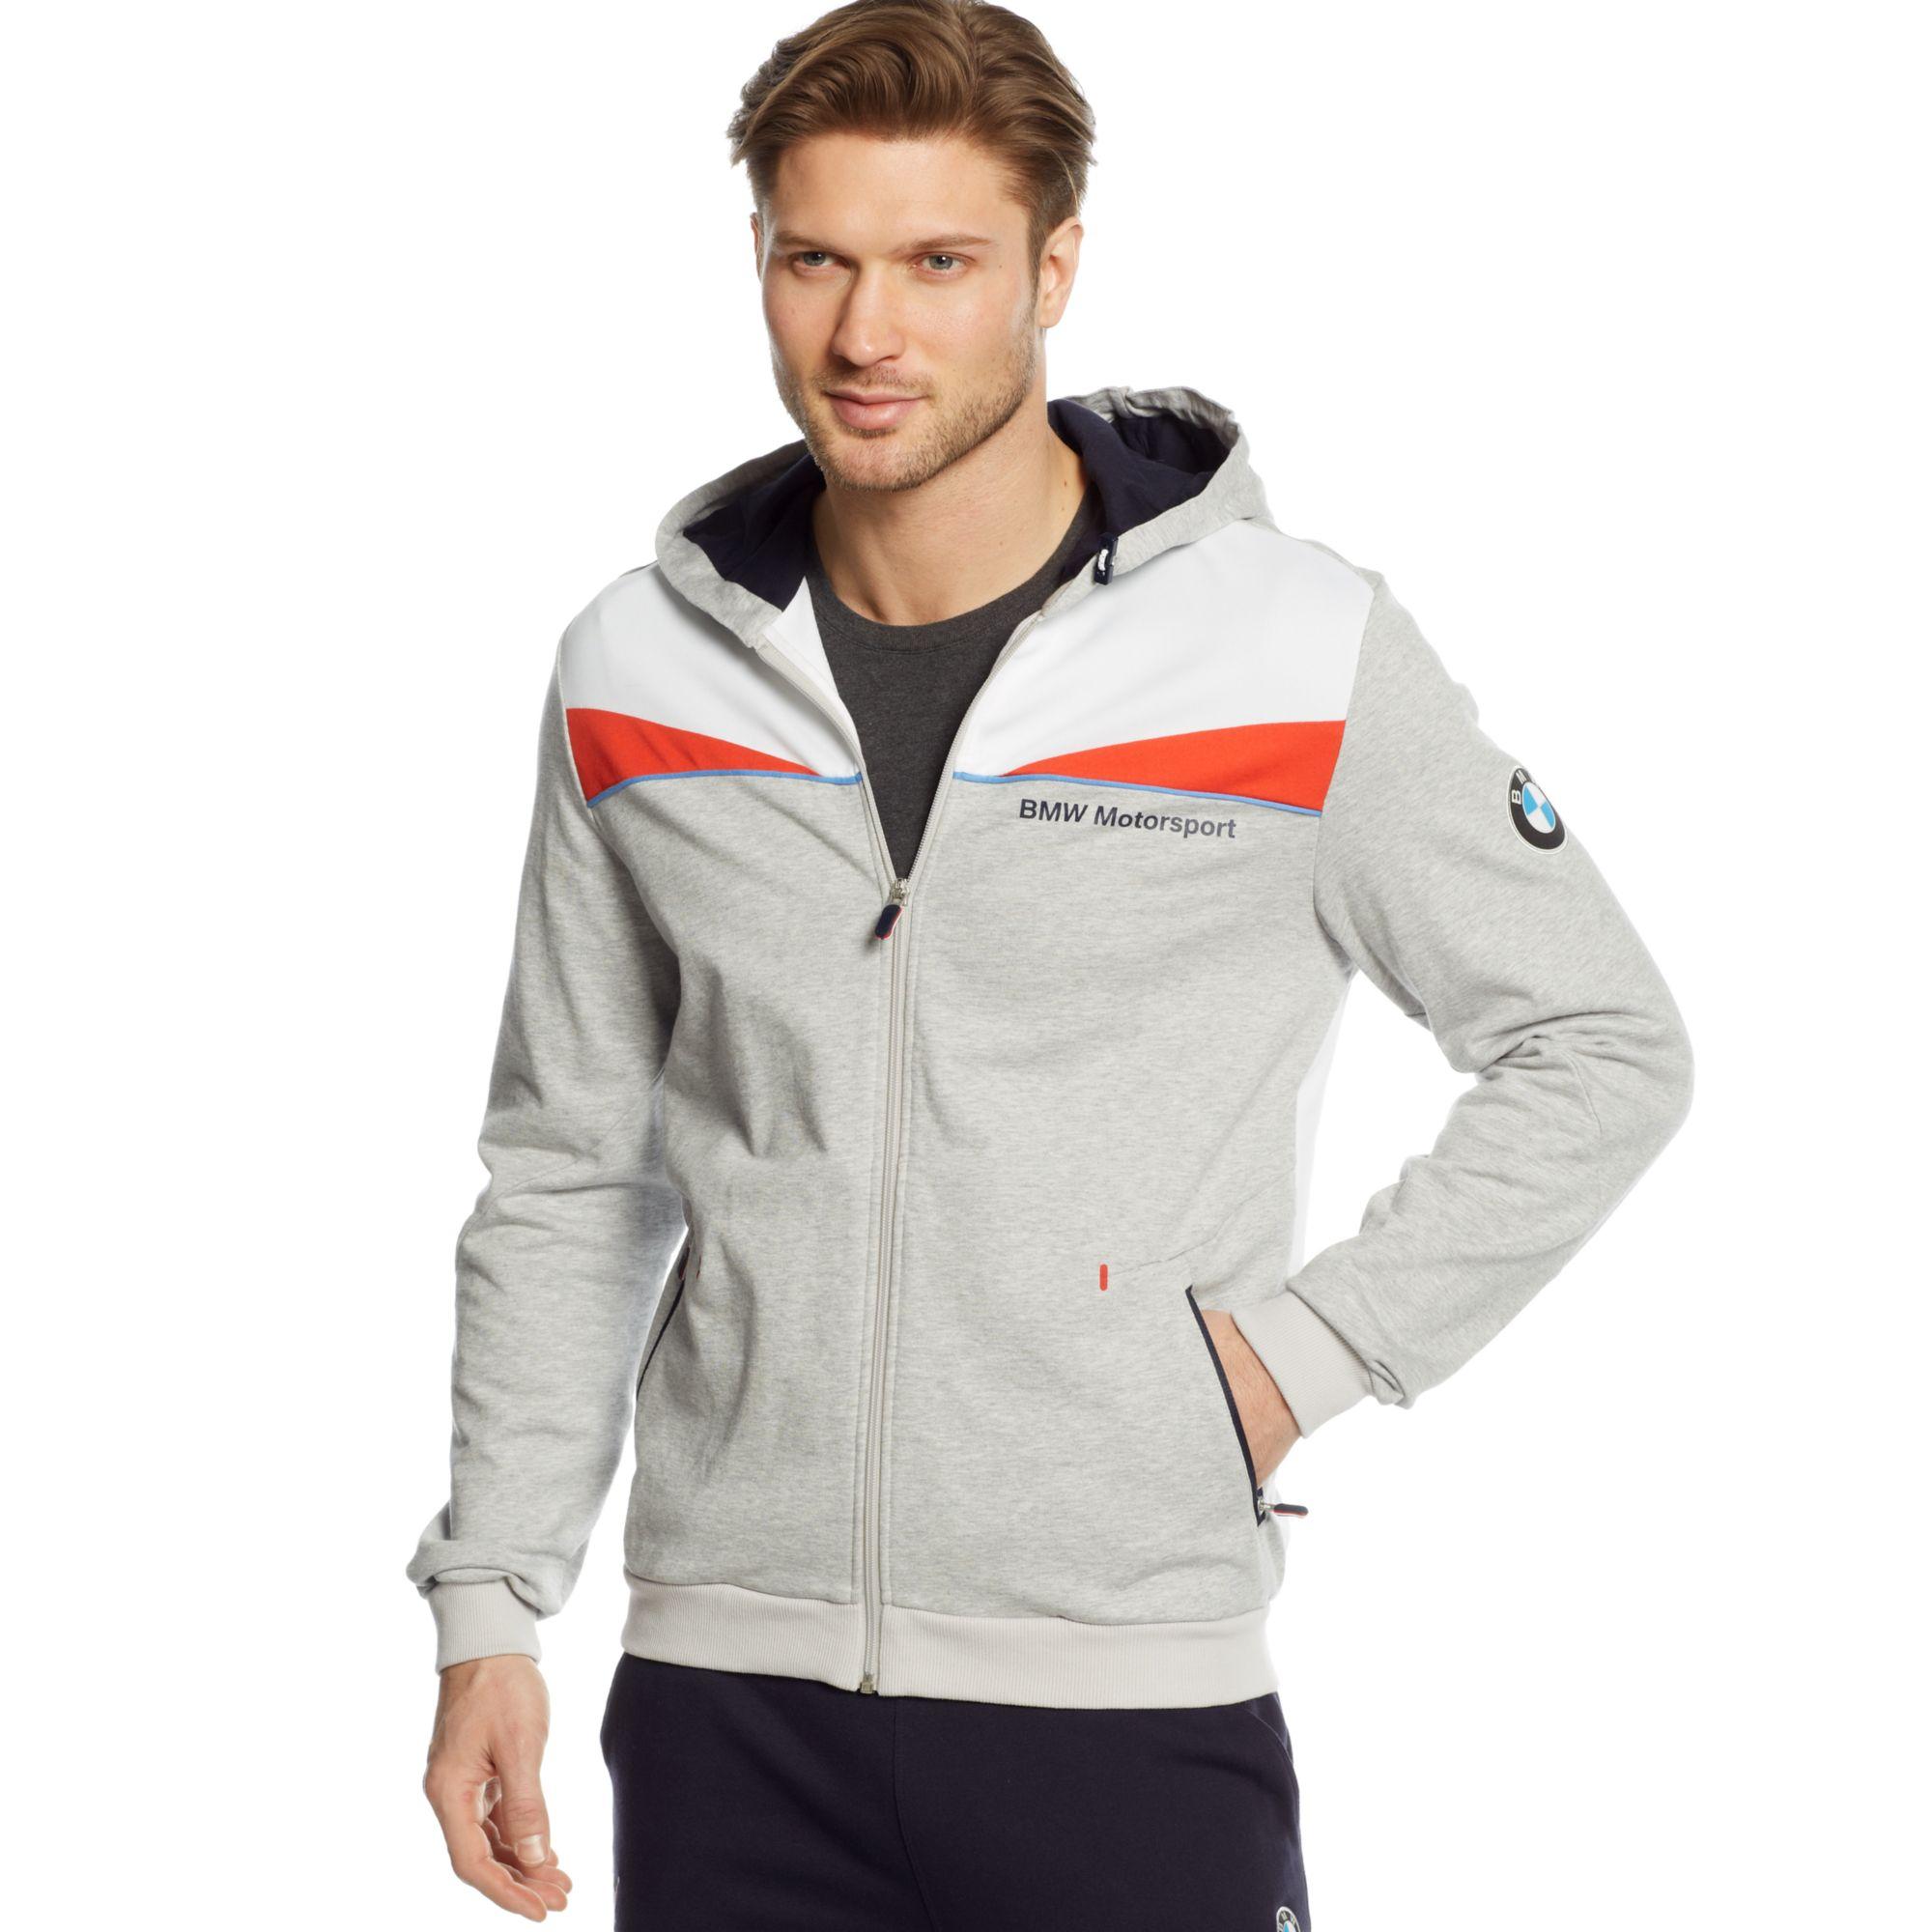 puma bmw hooded sweat jacket in gray for men light grey. Black Bedroom Furniture Sets. Home Design Ideas